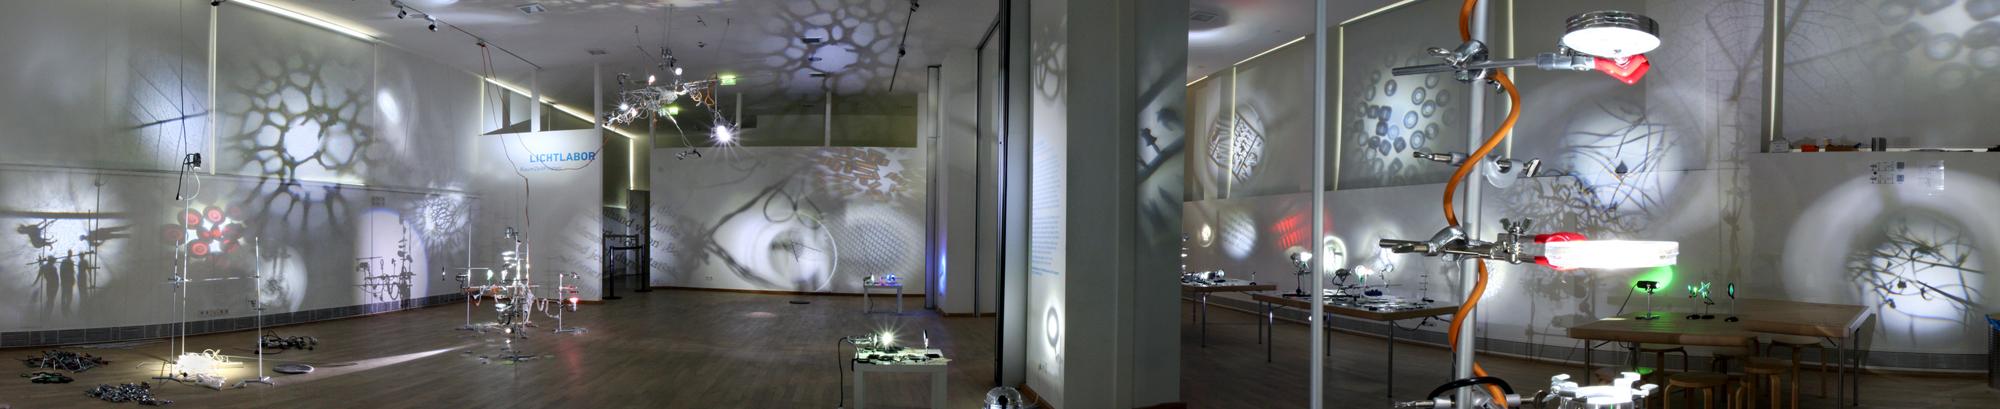 LichtLabor_MuseumKunstpalast_RaumZeitPiraten_Panorama_LinkeSeite